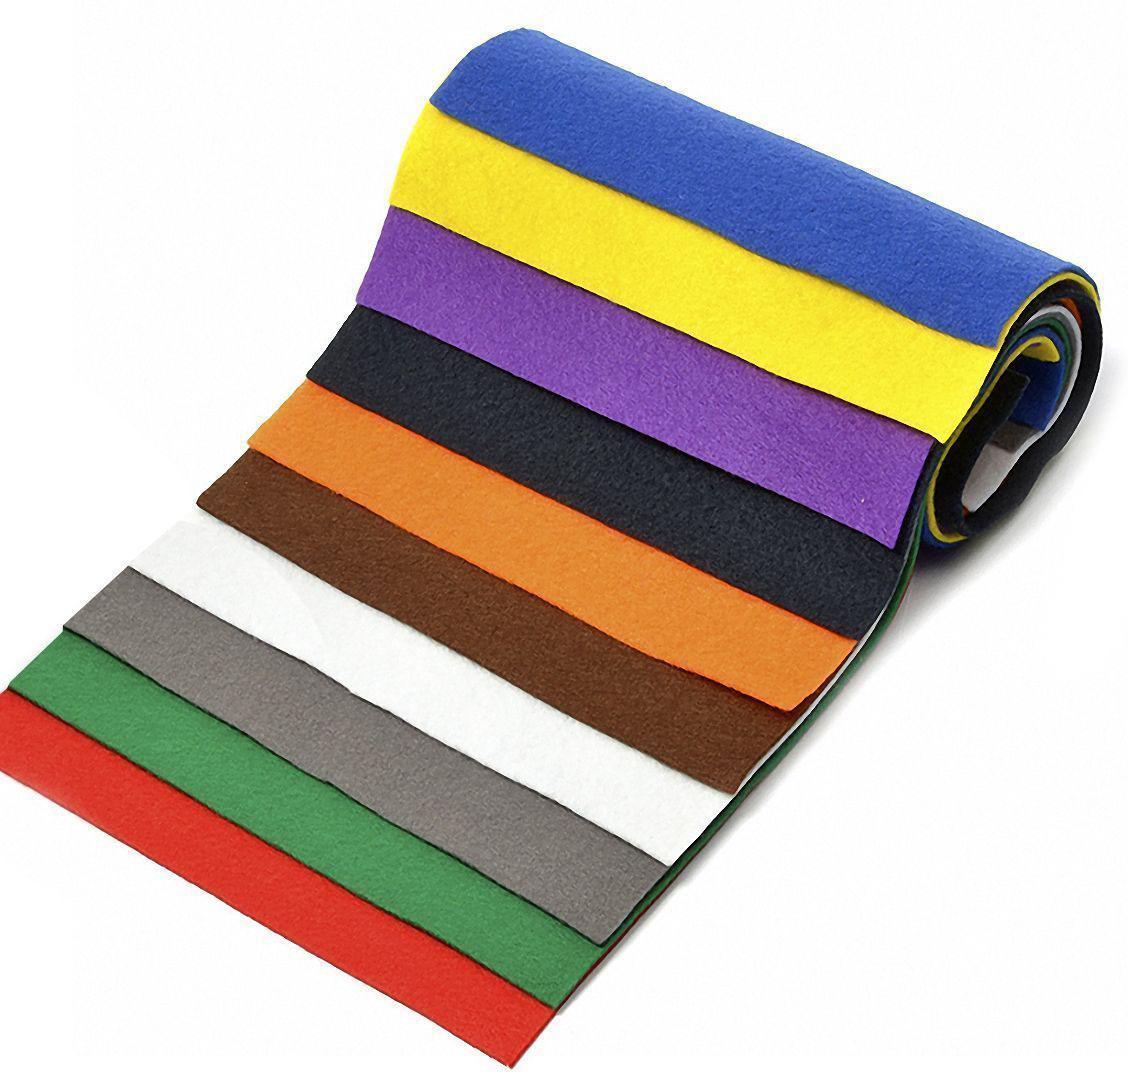 Набор листового фетра Ideal, мягкий, 1 мм, 20 х 30 см, 10 листов. TBY.FLT-SA1 ideal shoes id005awitk36 ideal shoes